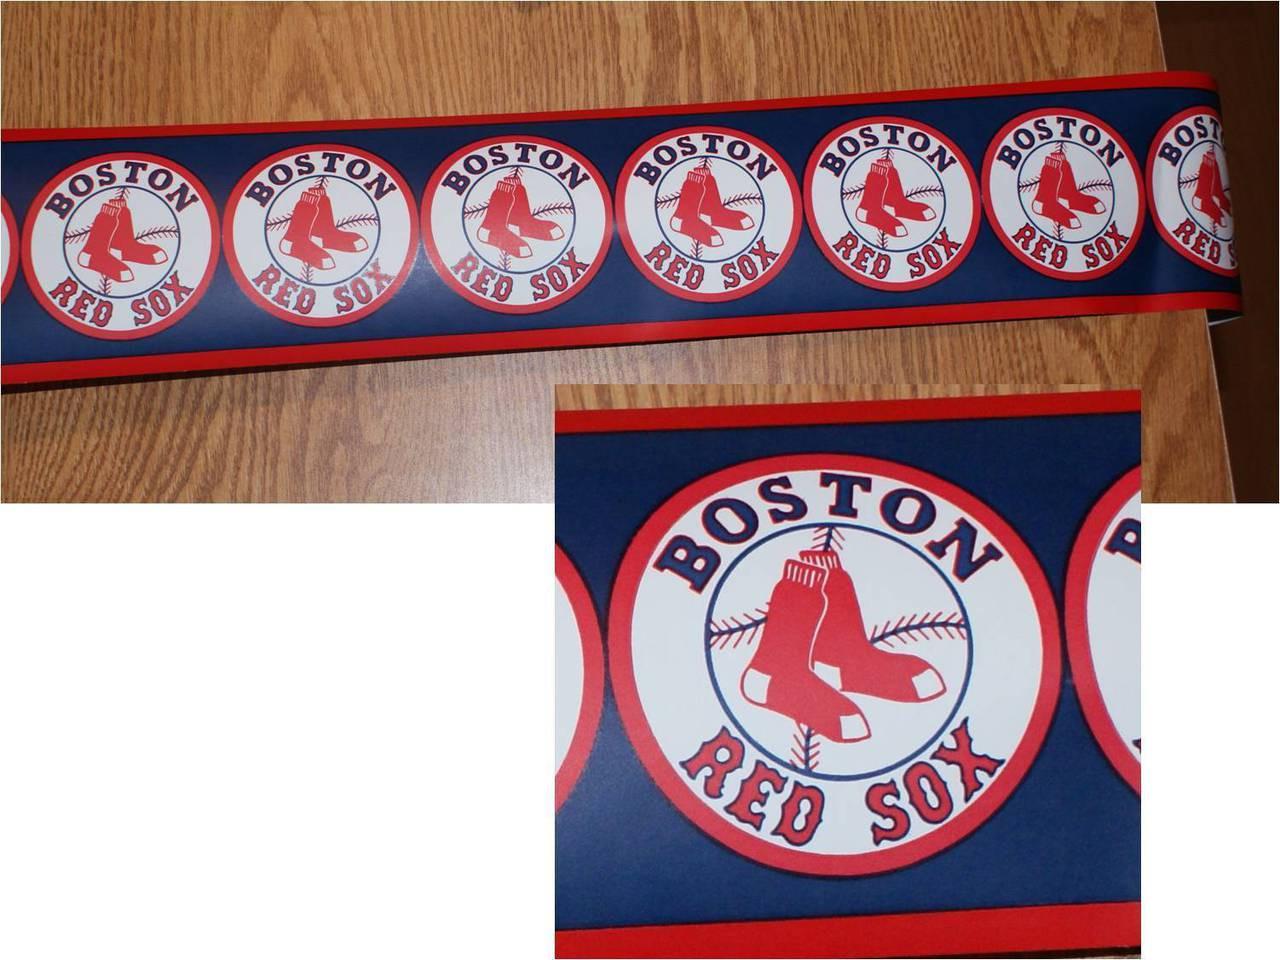 BOSTON RED SOX WALLPAPER BORDER